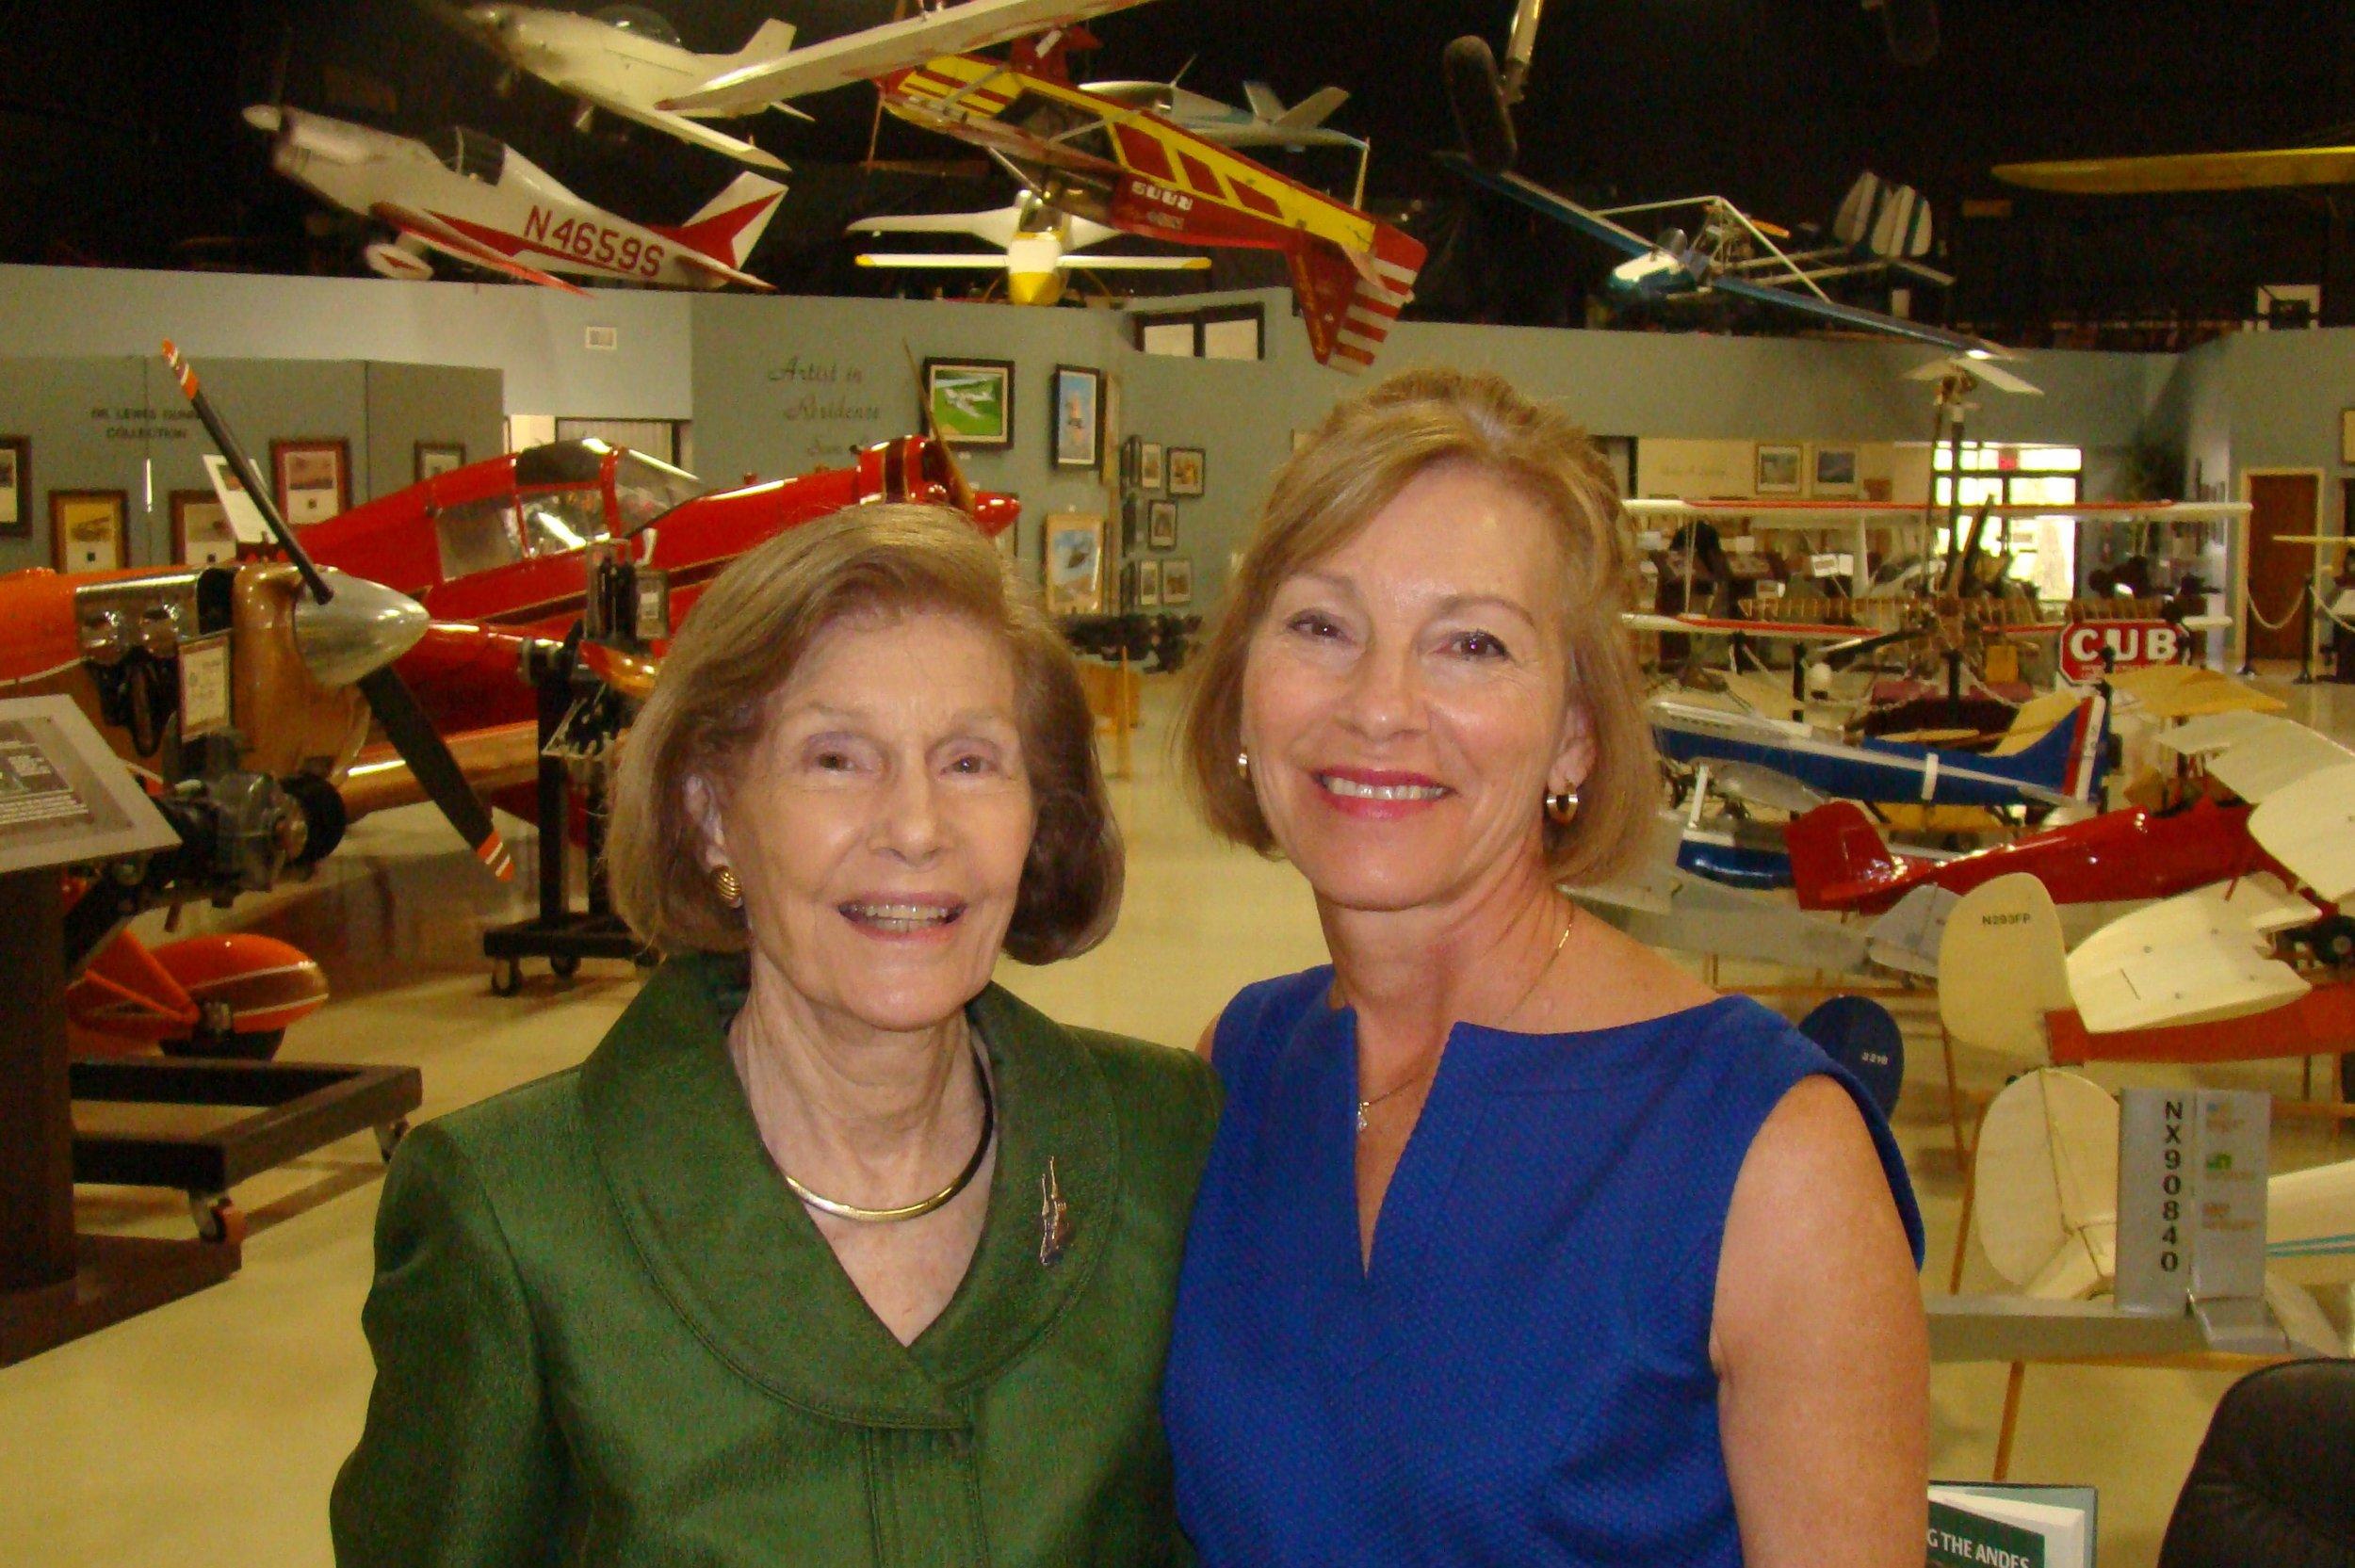 Dottie Krusen & Rosie O'Connor after FAHOF Induction Ceremony, 28 Jan '12.JPG